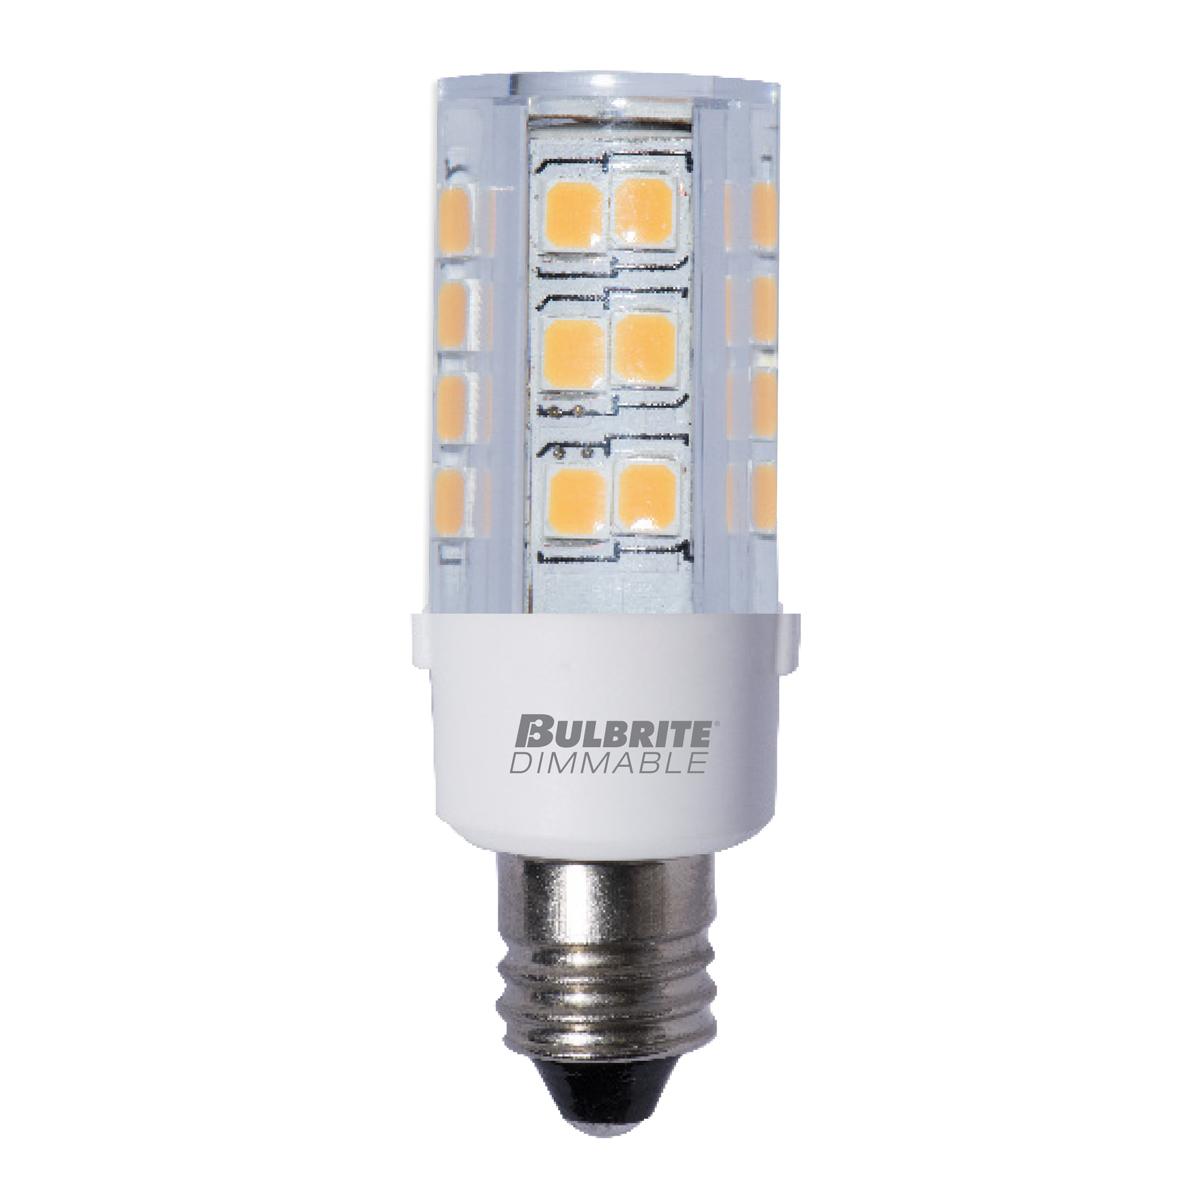 Mini Candelabra Base Led Bulb: Lamp Parts - Lighting Parts - Chandelier Parts